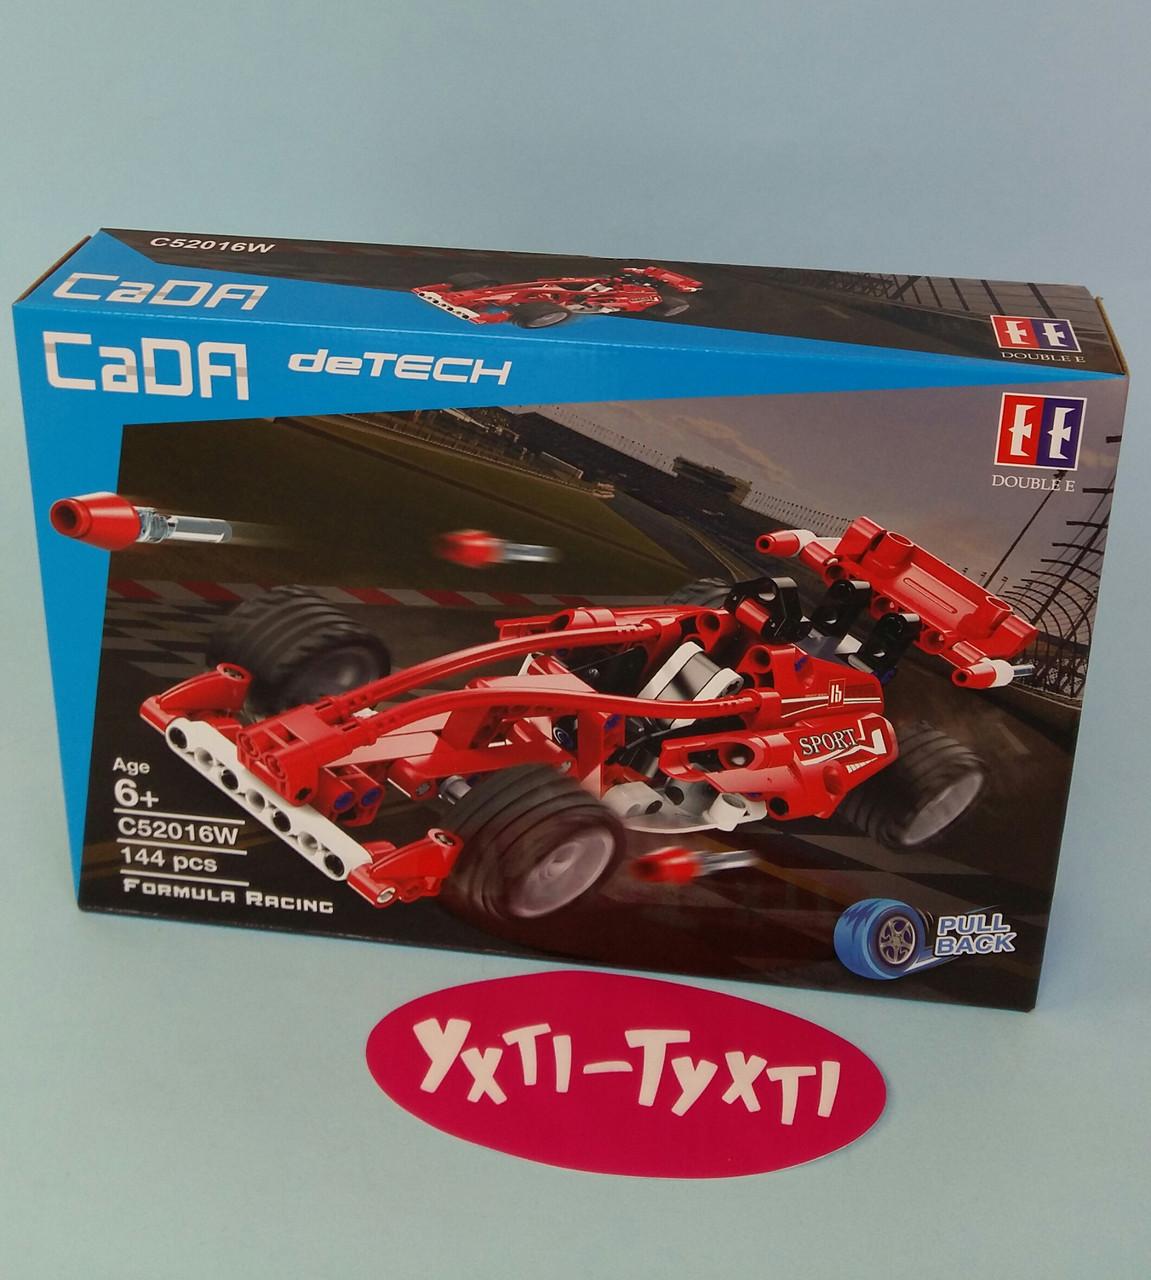 Конструктор гоночна машина, Конструктор CaDFI deTECH C52016W